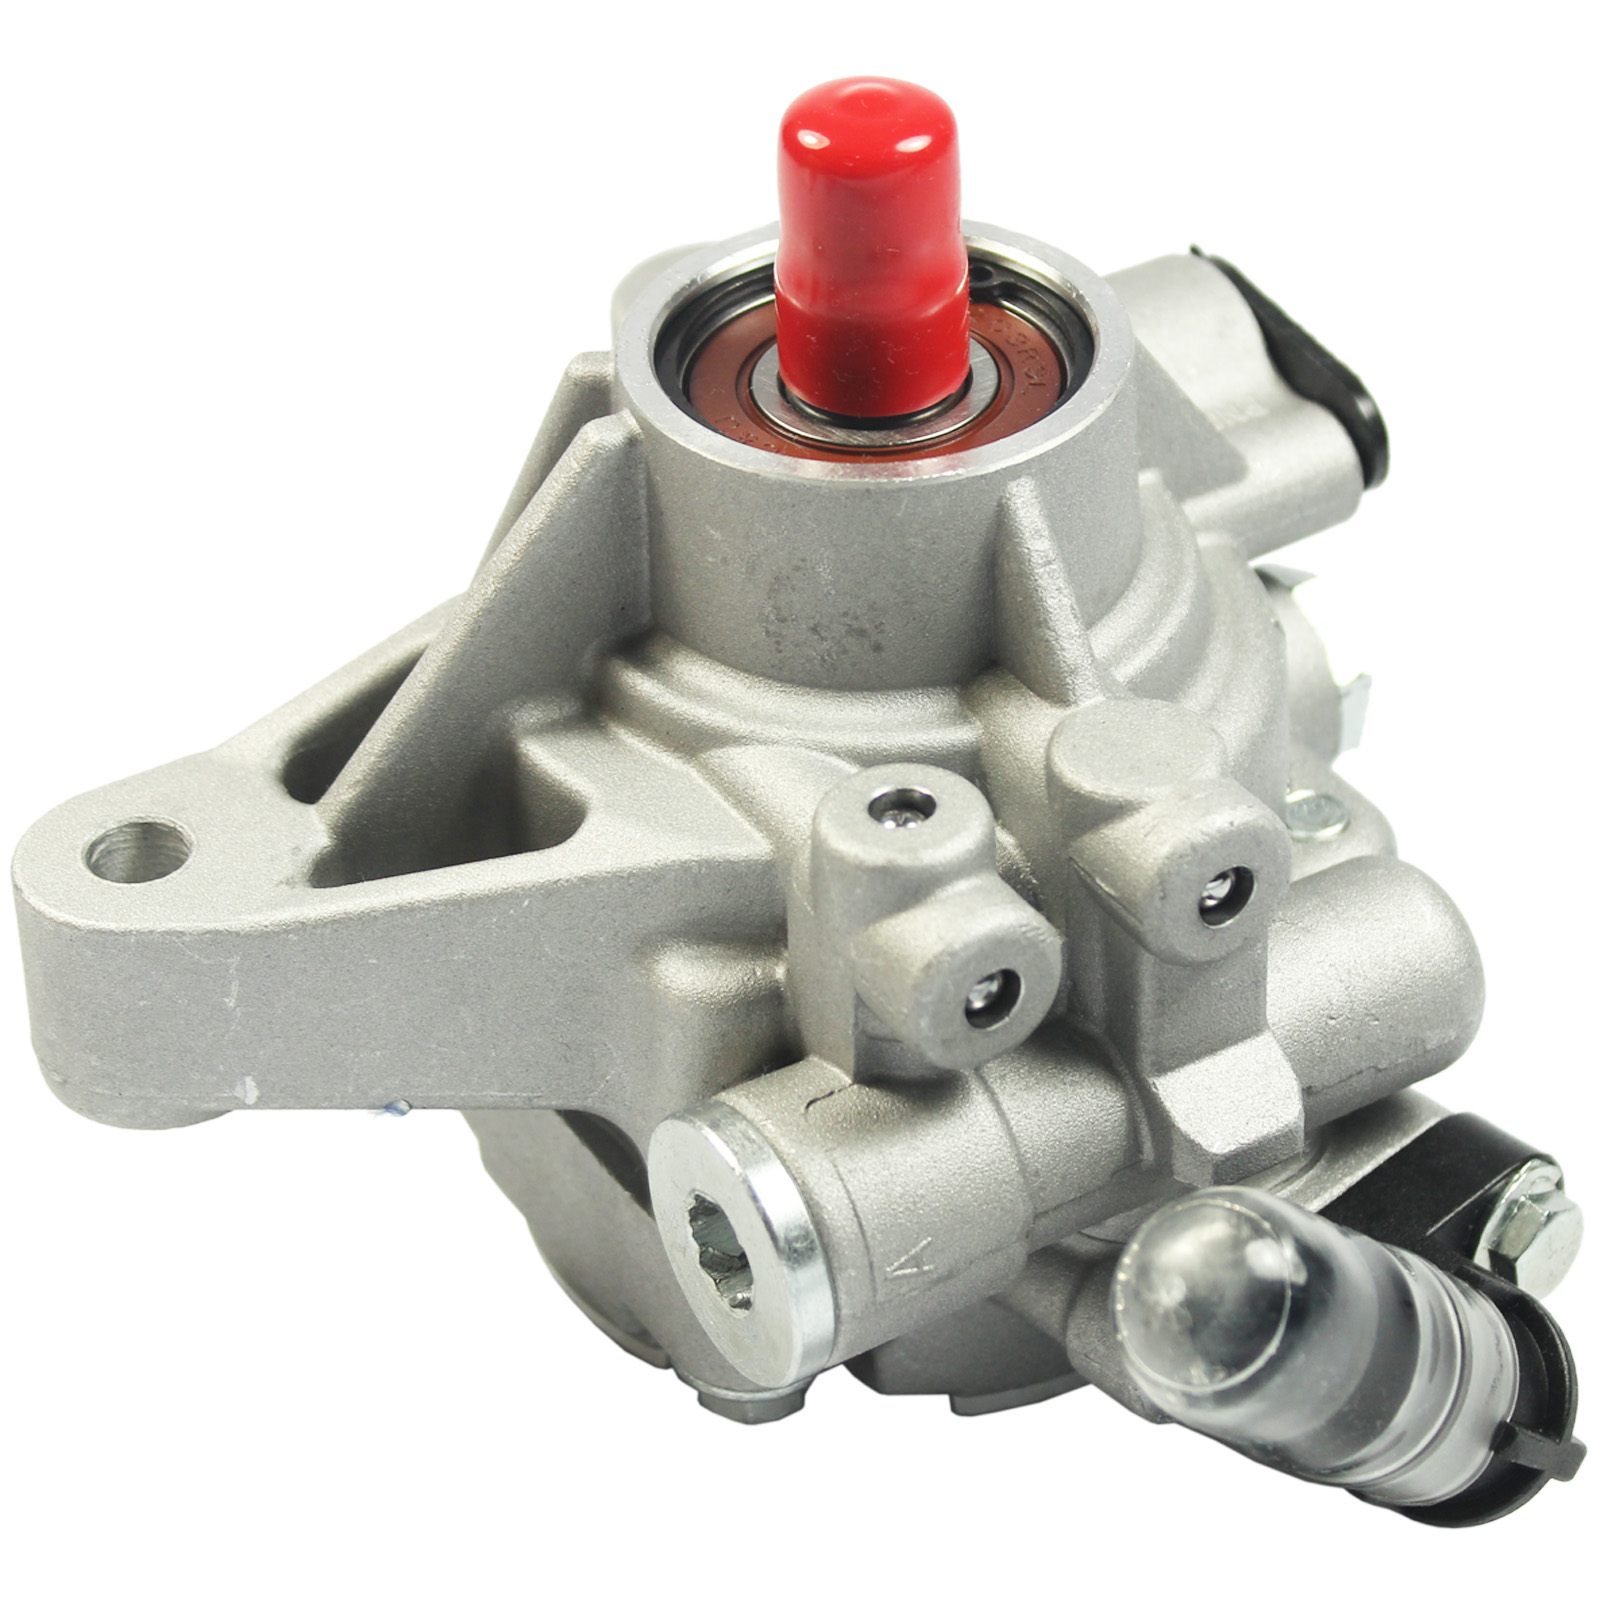 New Power Steering Pump For Honda Accord CR-V Element